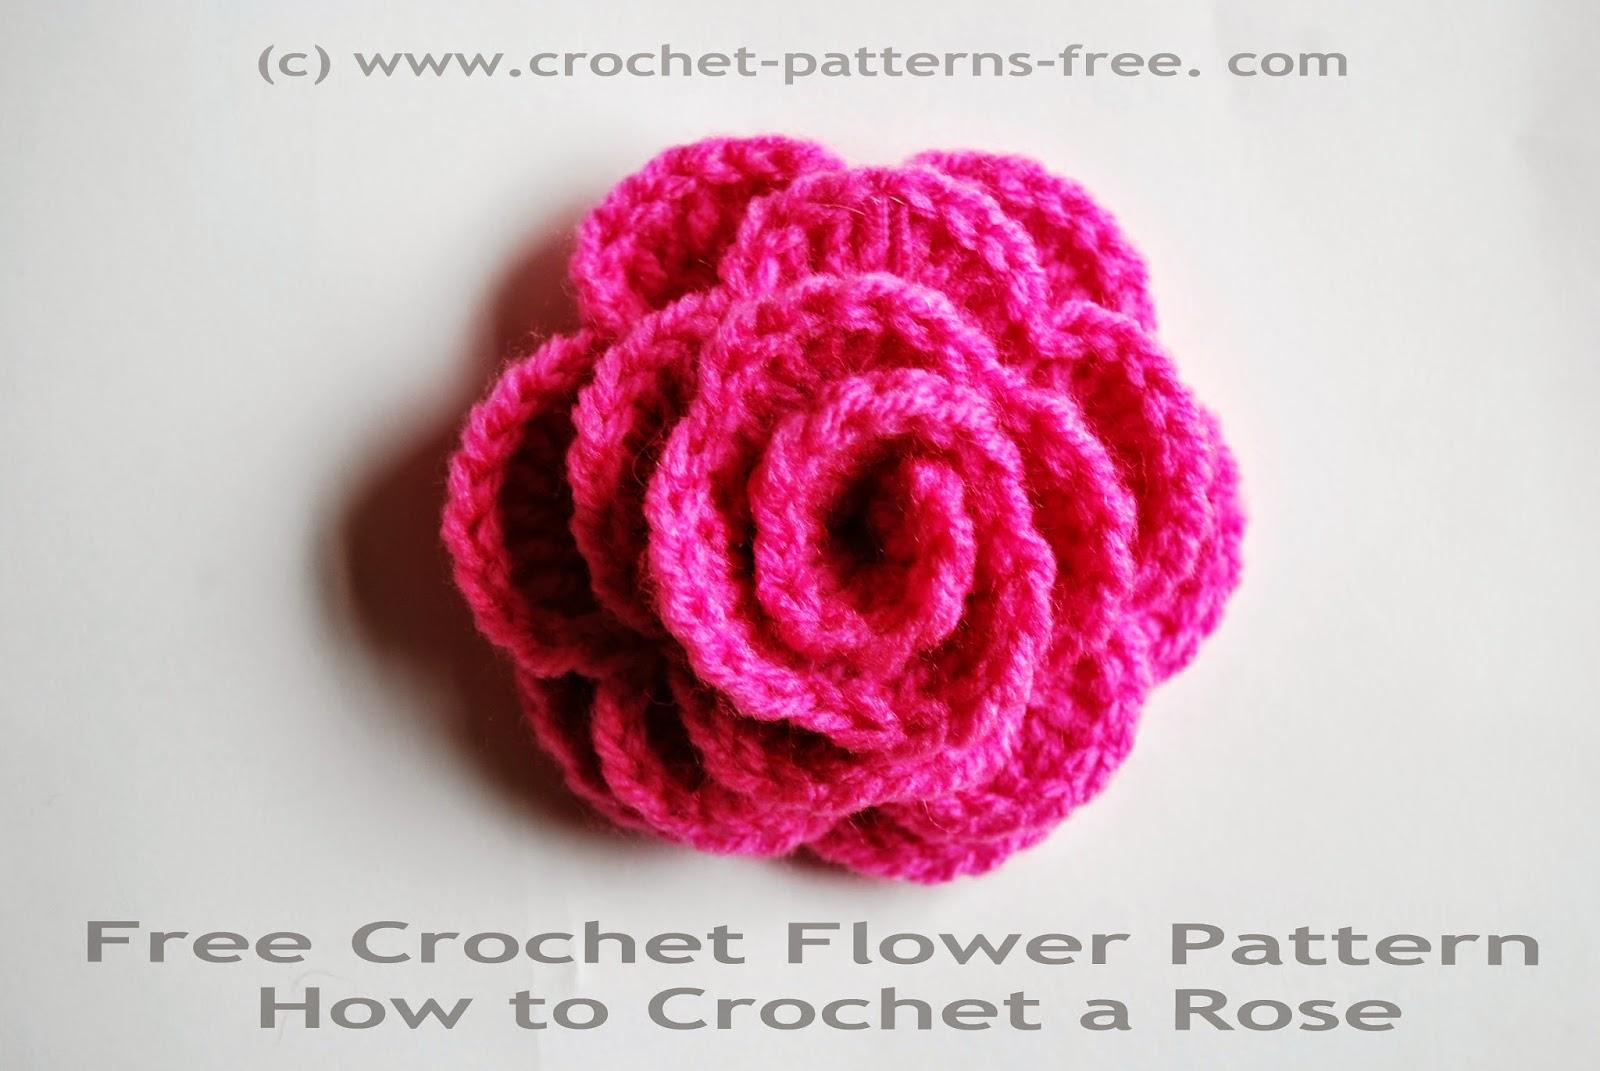 Simply Crochet Flower Patterns Gardening Flower And Vegetables